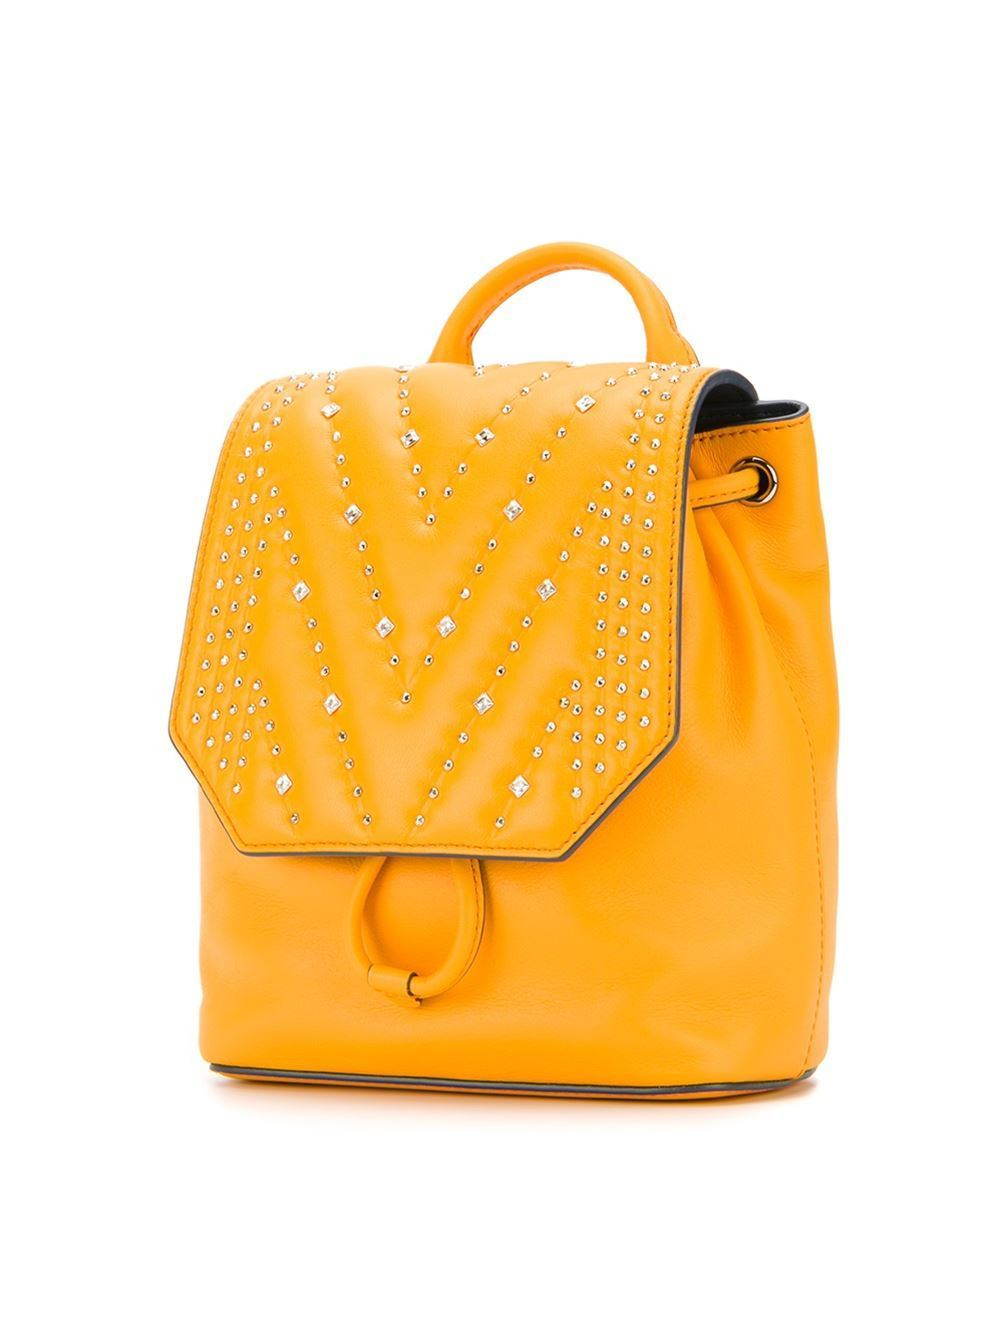 mcm vip sale sama to be studded backpack buyma. Black Bedroom Furniture Sets. Home Design Ideas